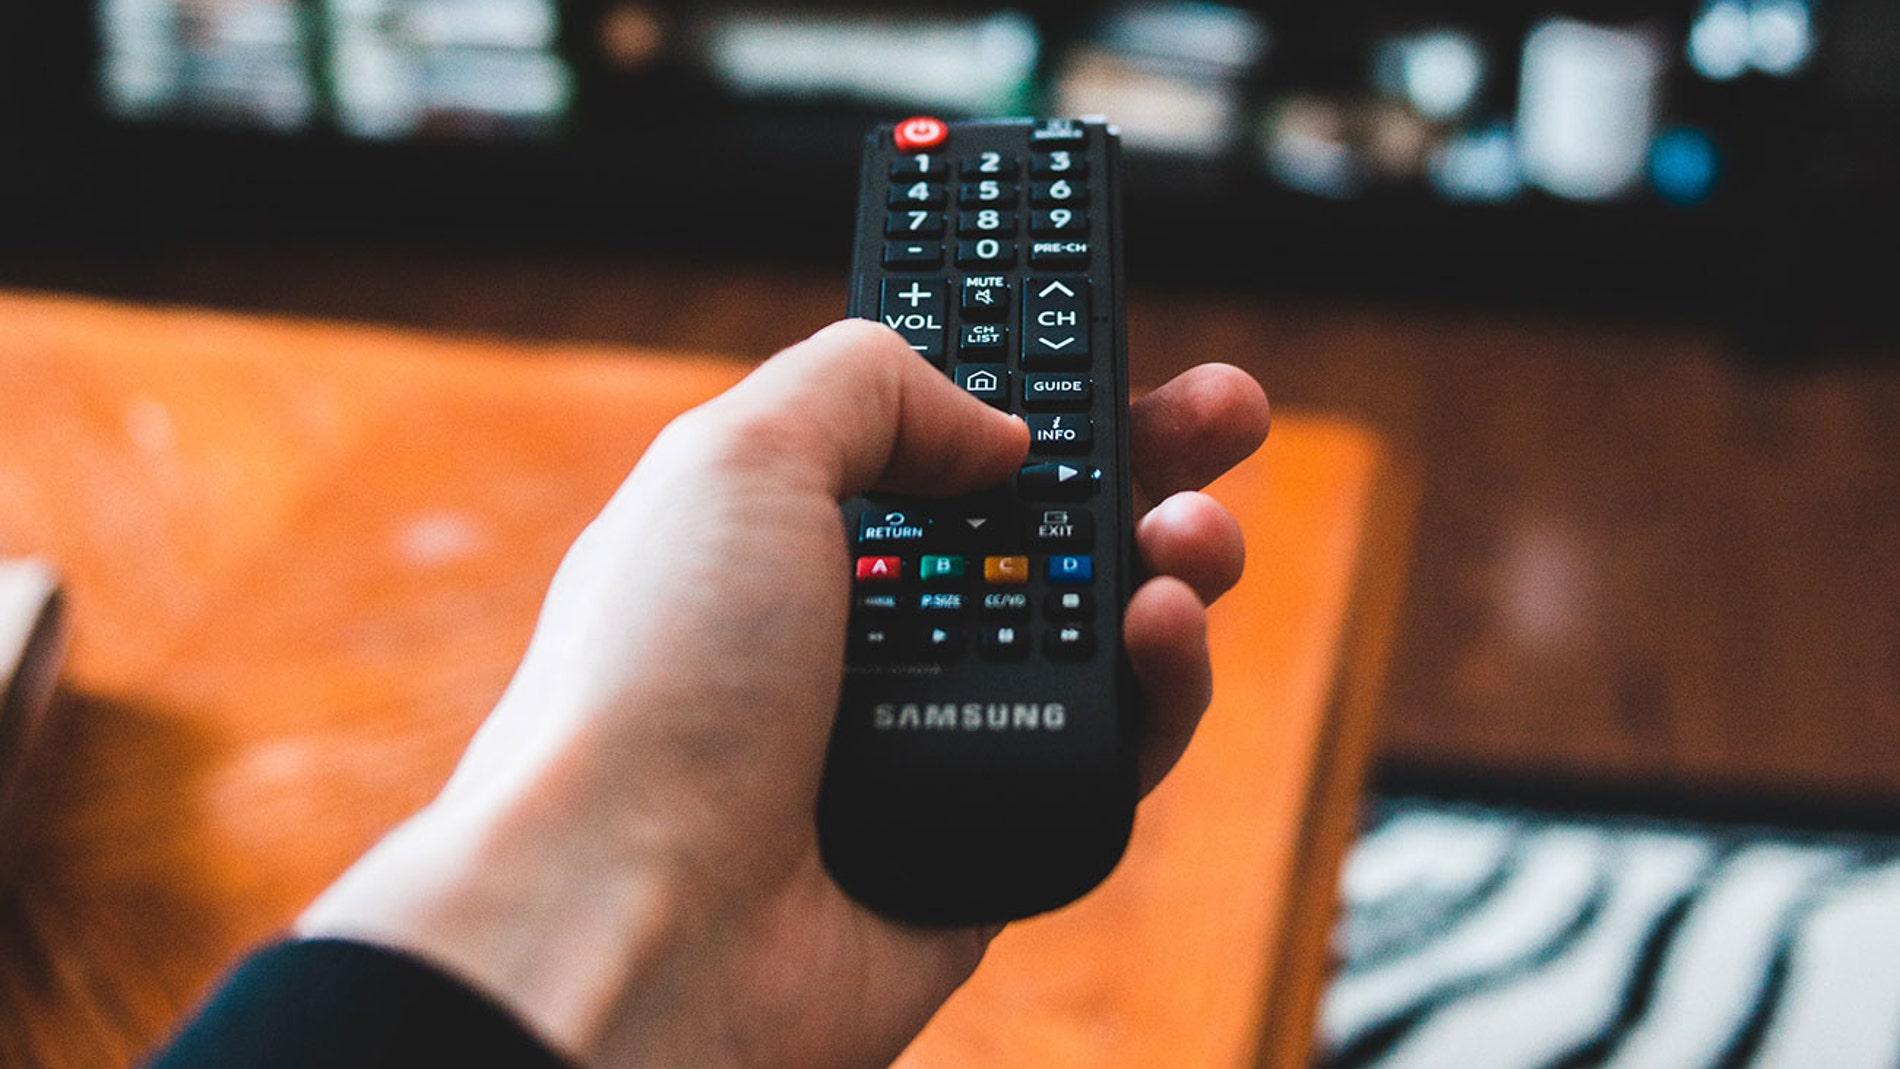 Mando del televisor